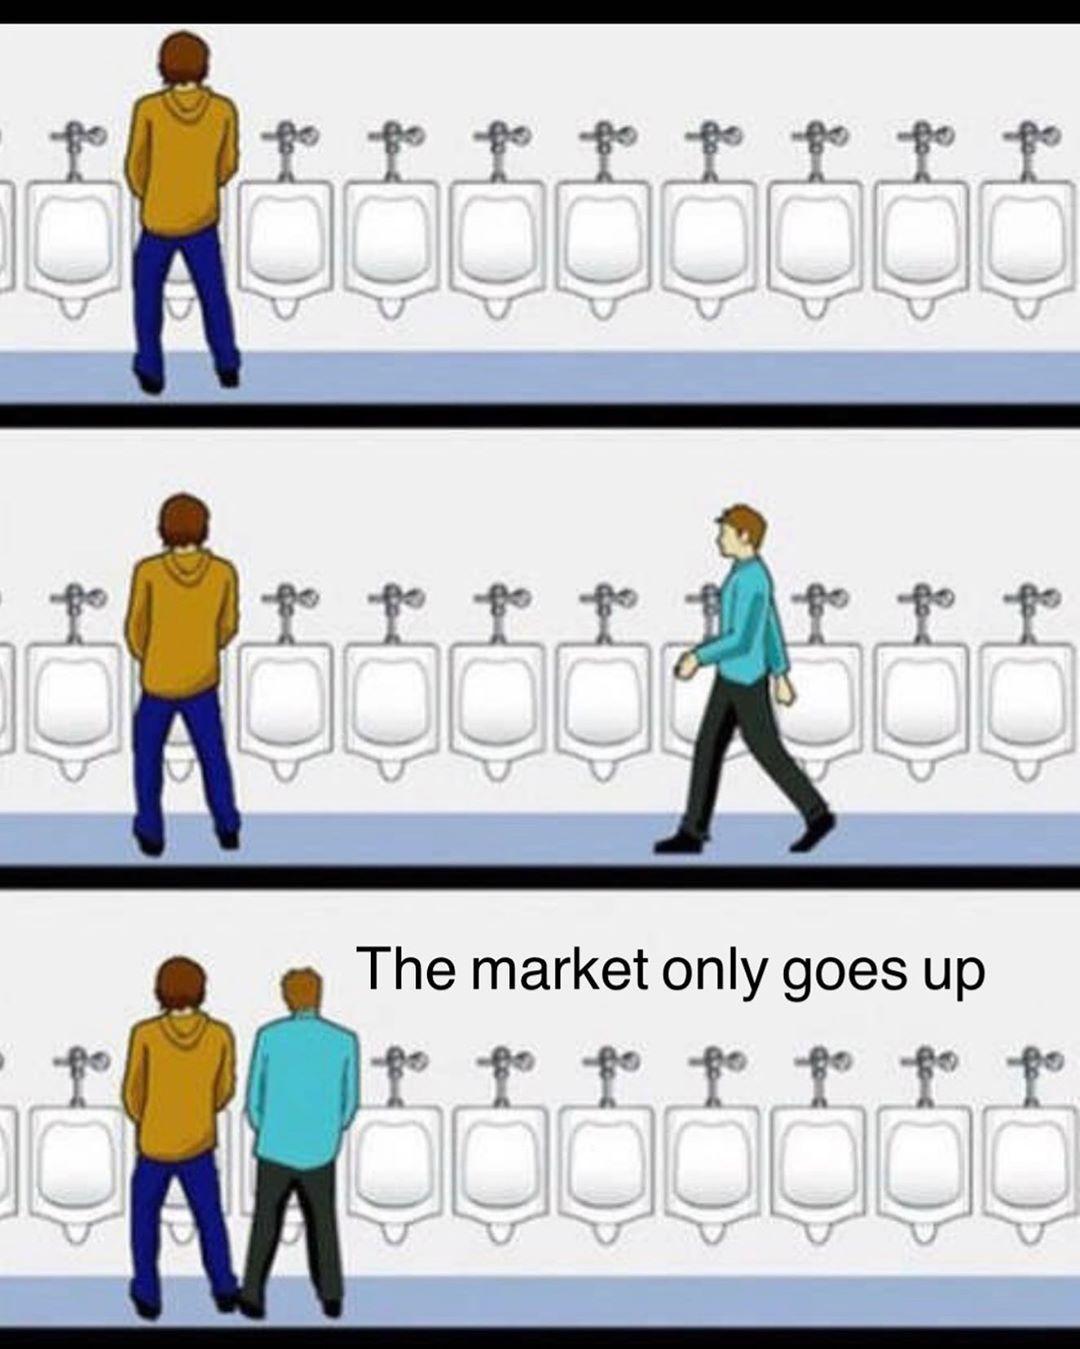 Trading Memes I Finance Humor On Instagram Financememes Tradingmemes Wallstreetmemes Wallstr In 2020 Personal Finance Blogs Investing Books Personal Finance Books